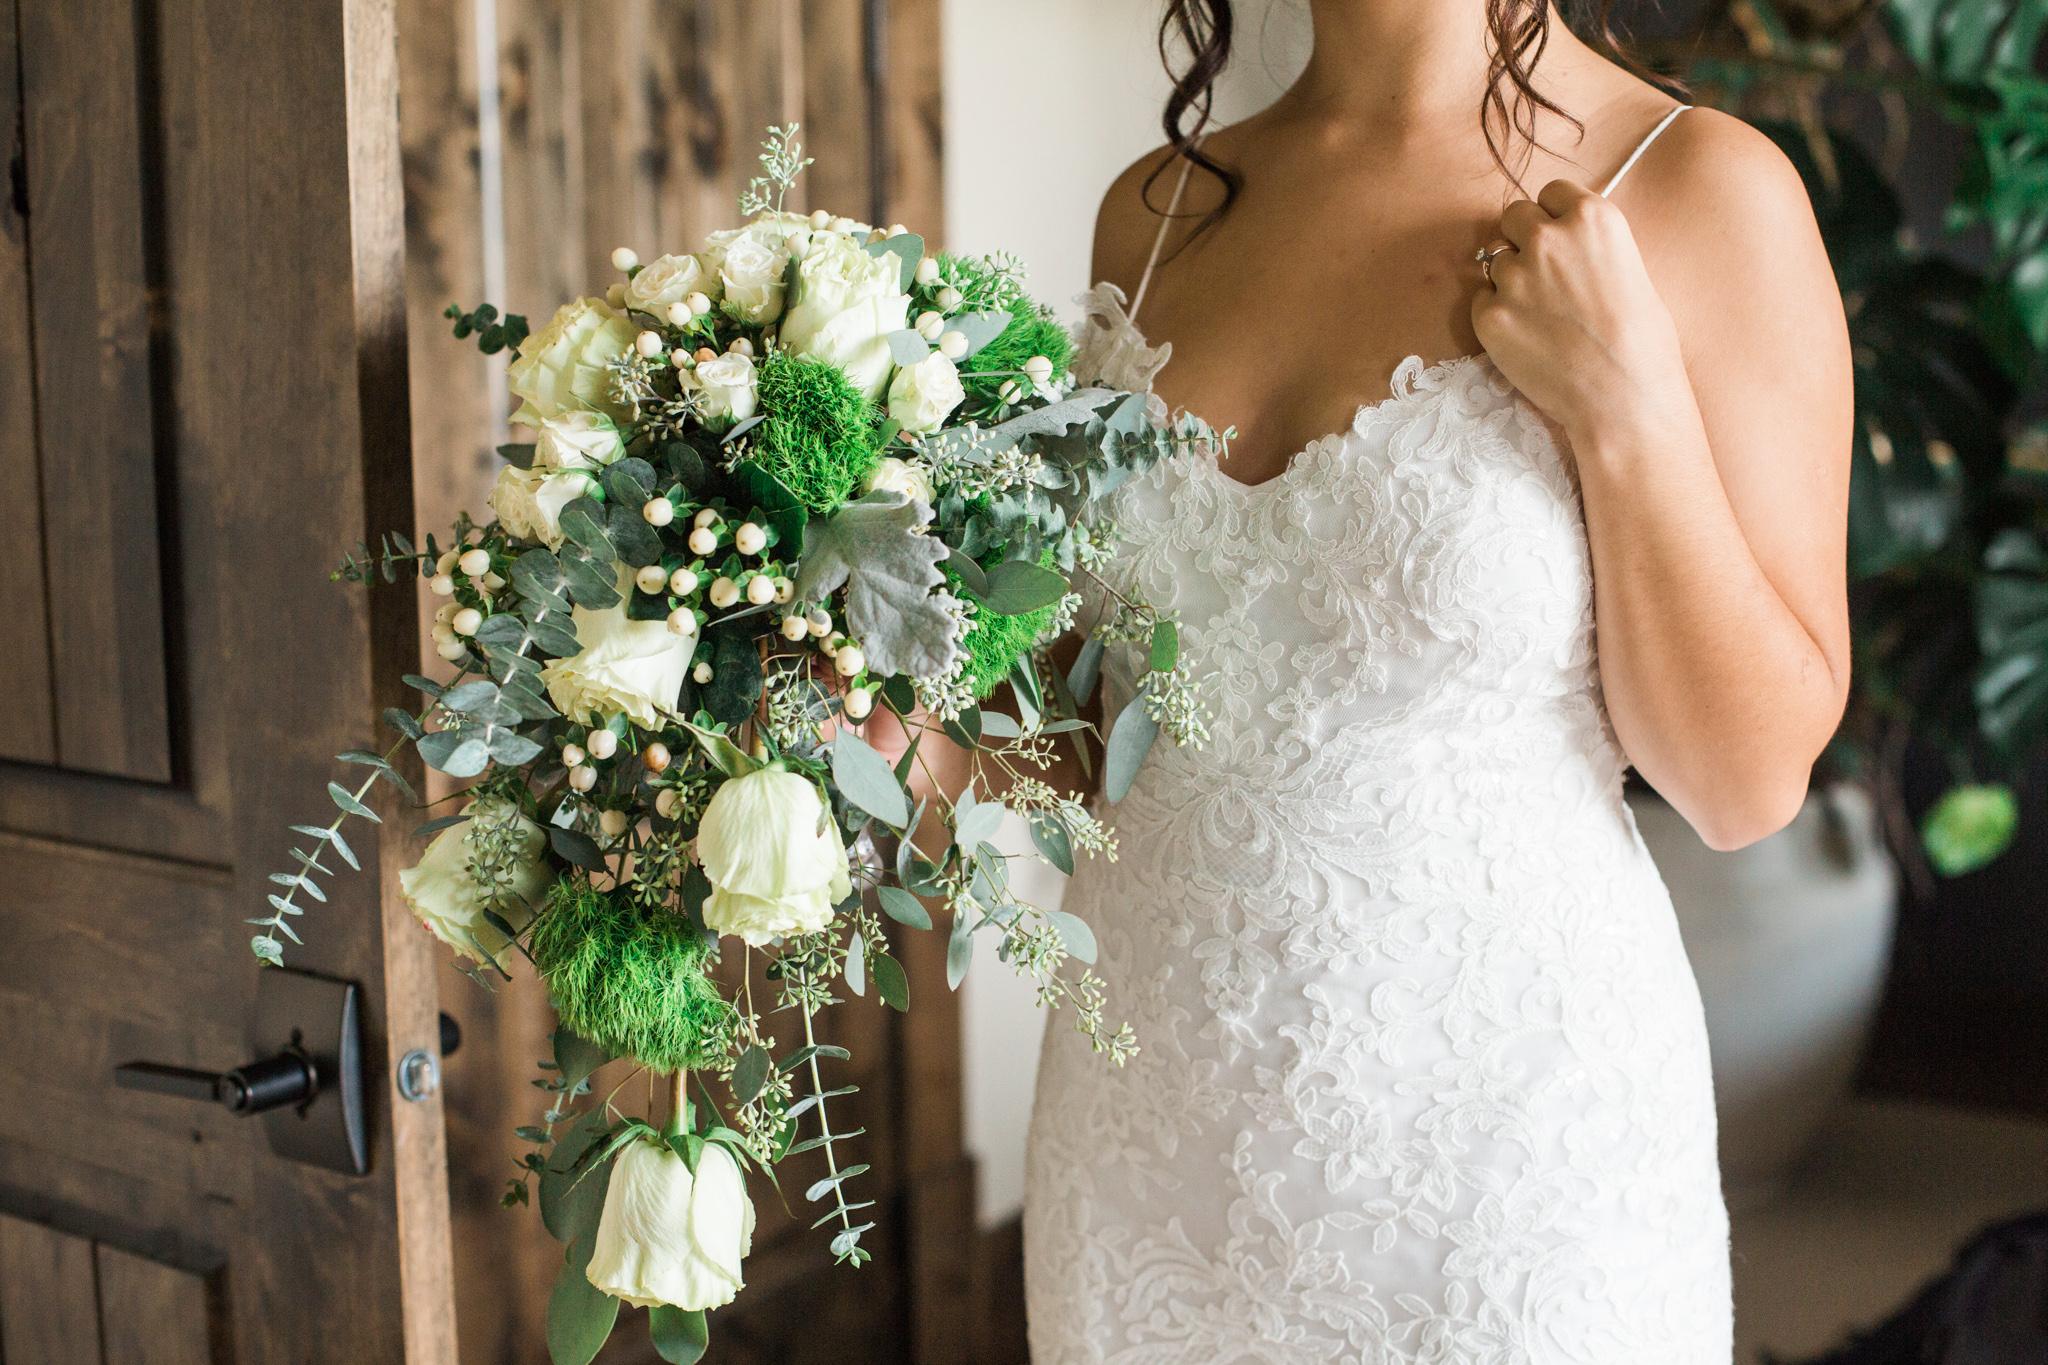 Olga_janni_wedding_090917_WEBSIZE (115 of 704).JPG